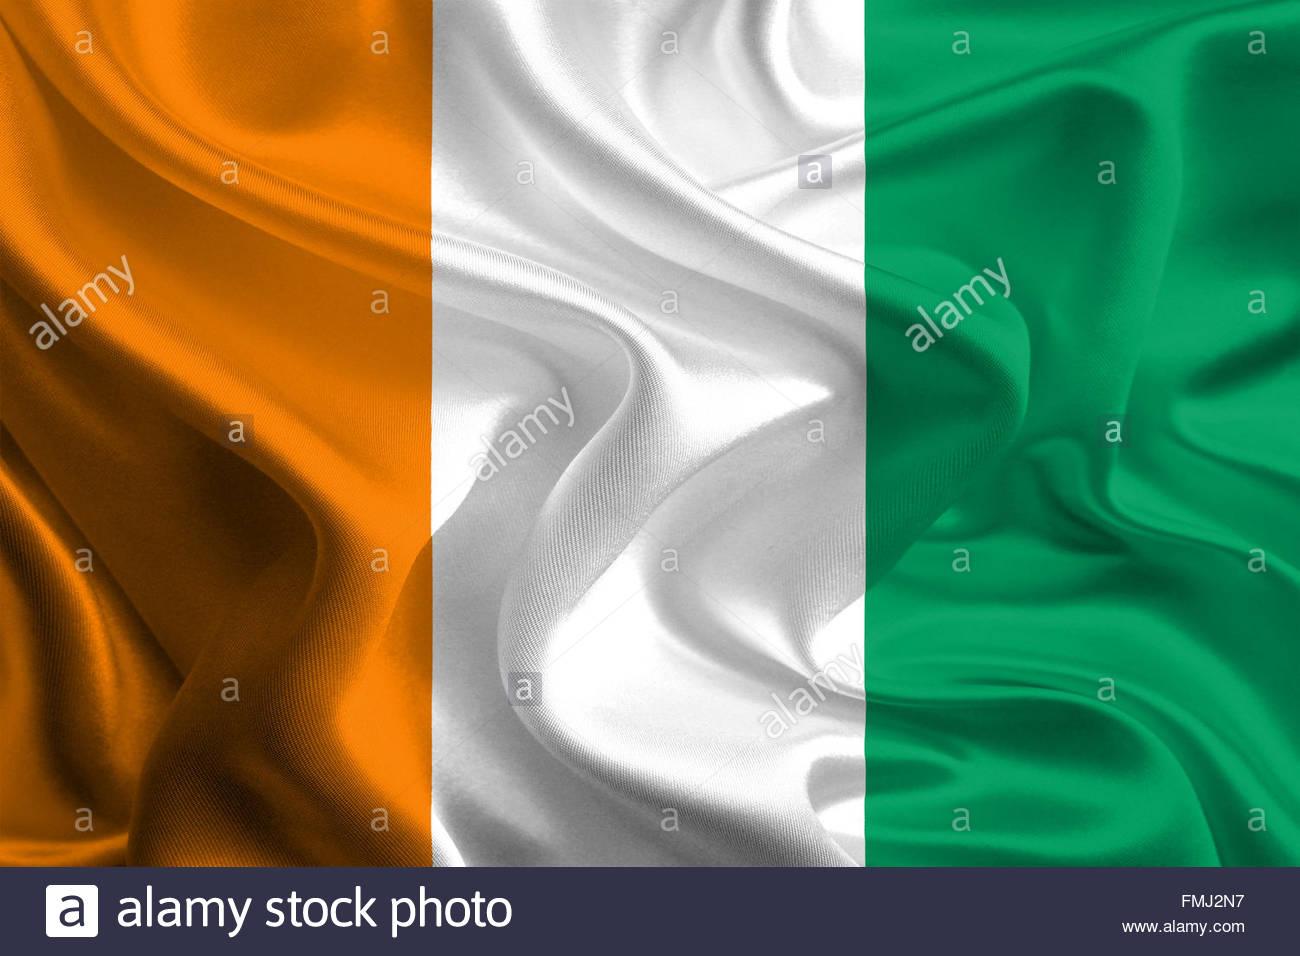 Flag of Cote d'Ivoire (Ivory Coast) - Stock Image